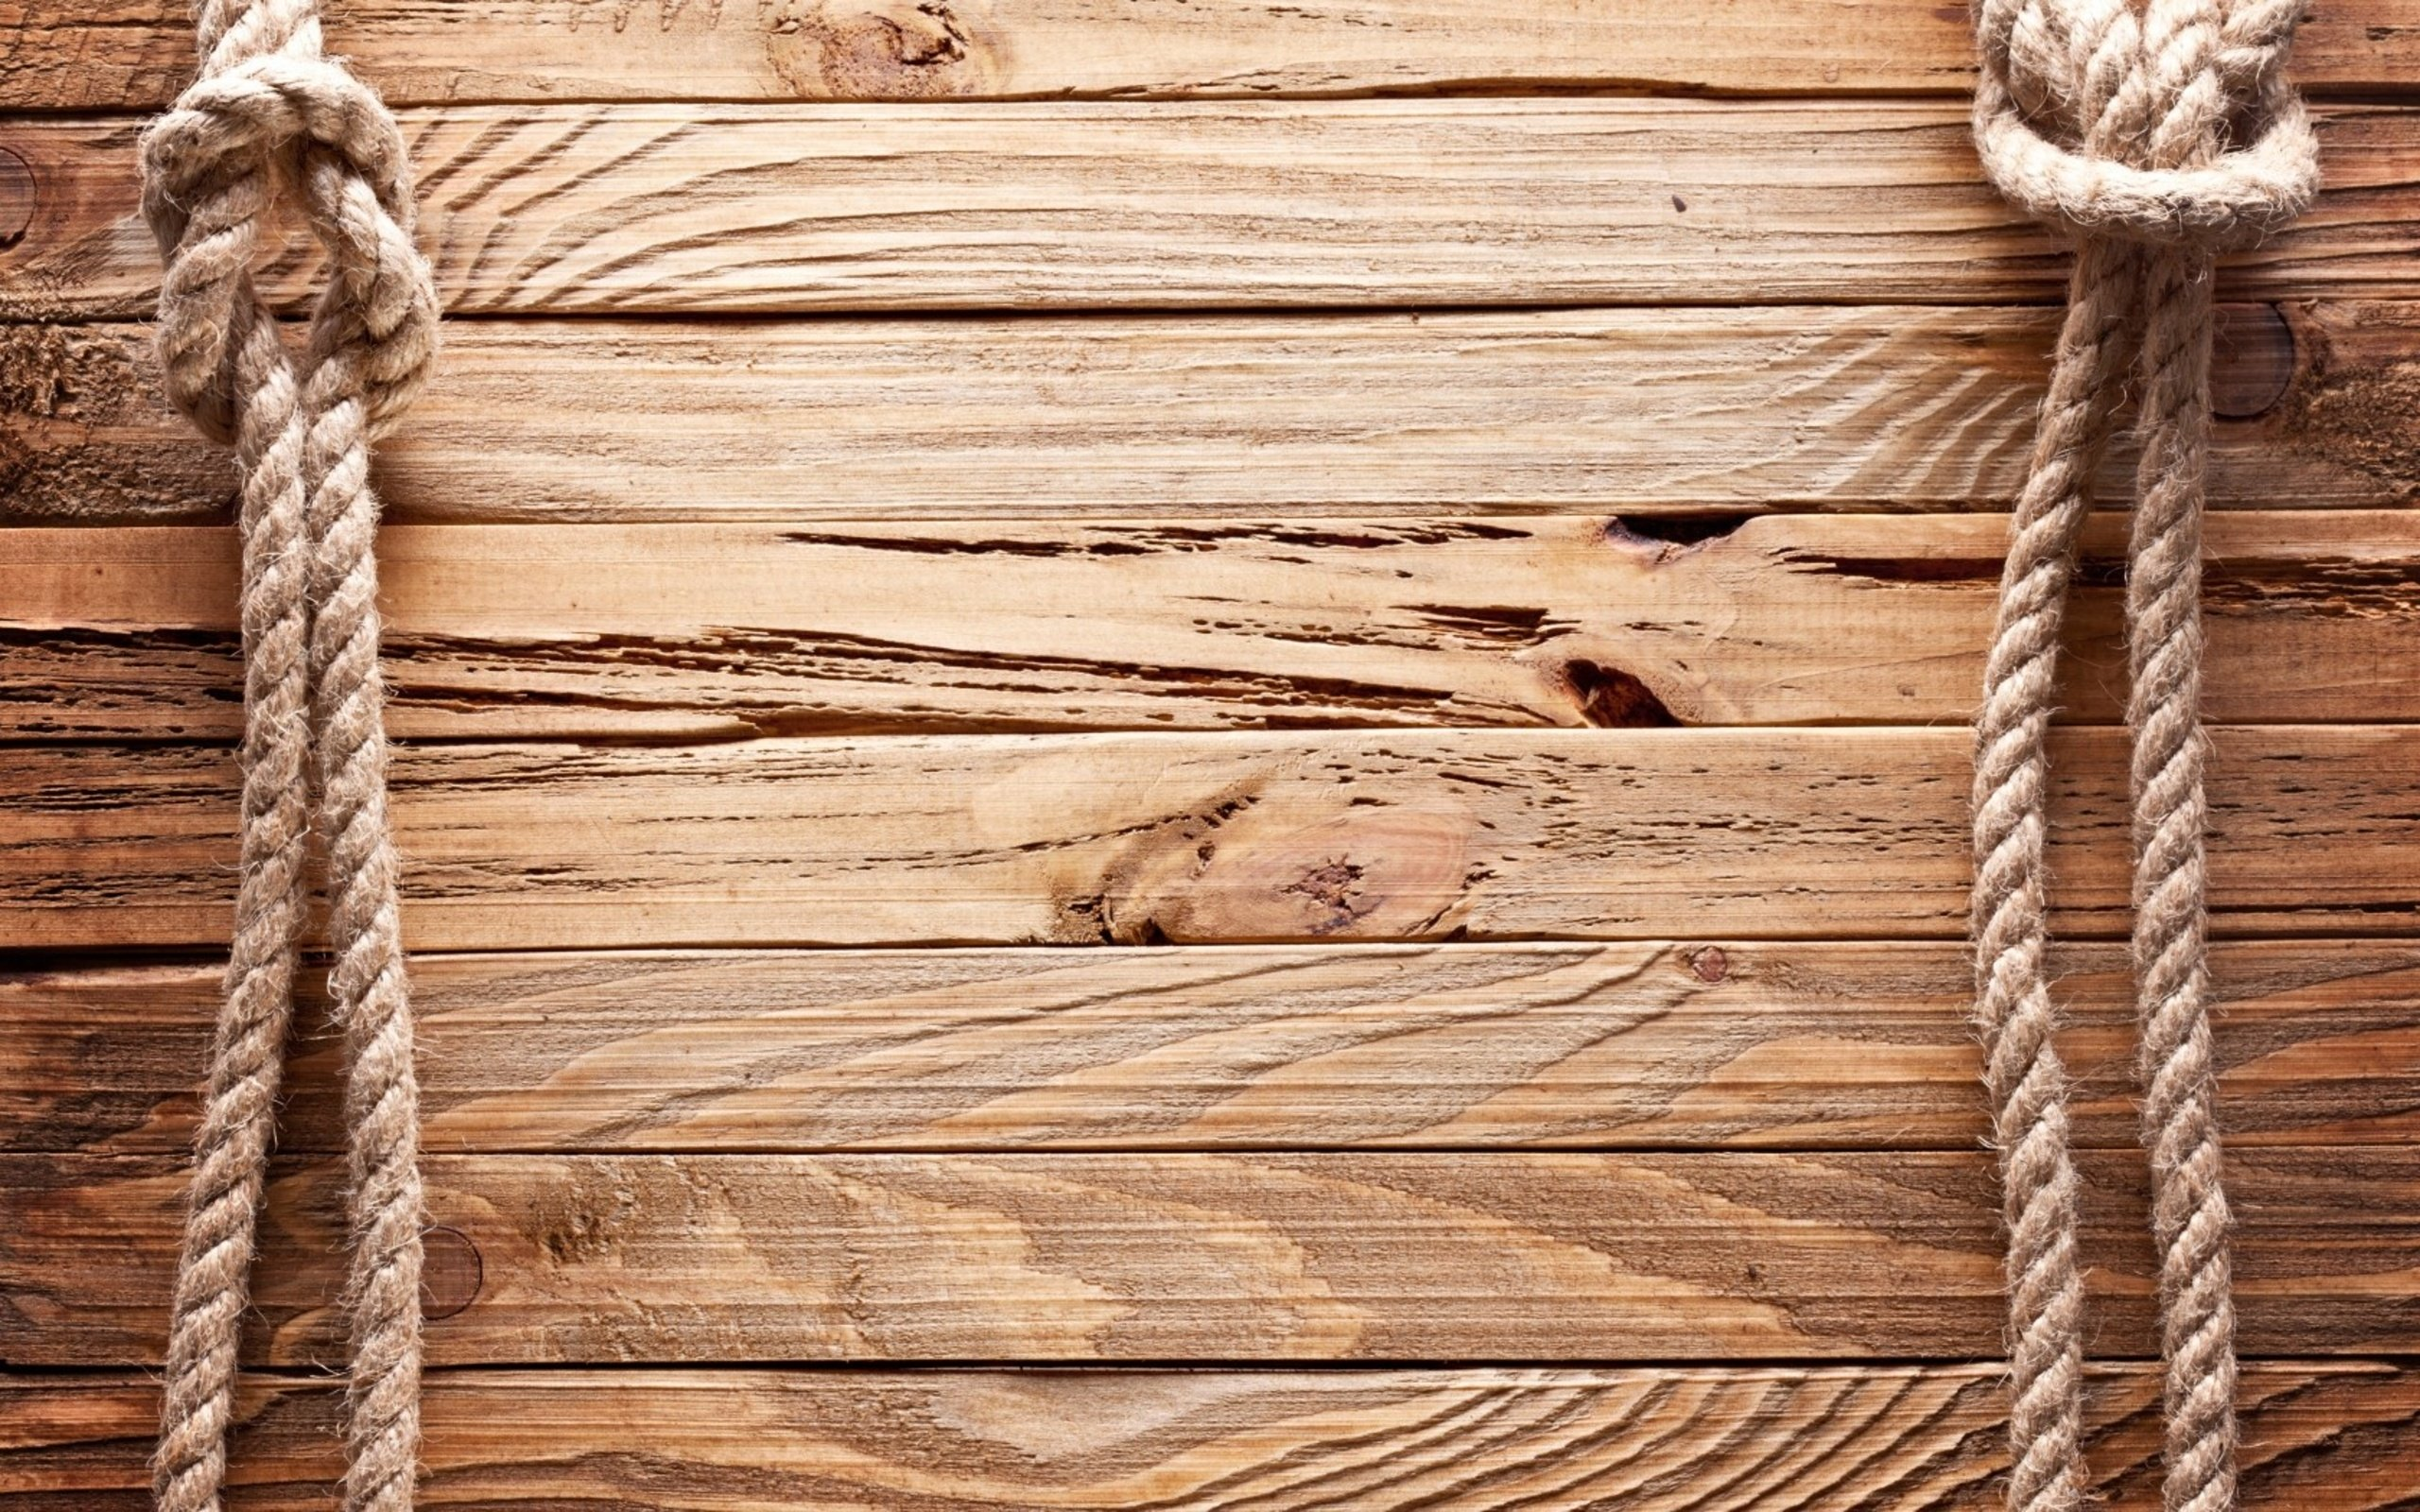 wood wallpaper 6 2560x1600